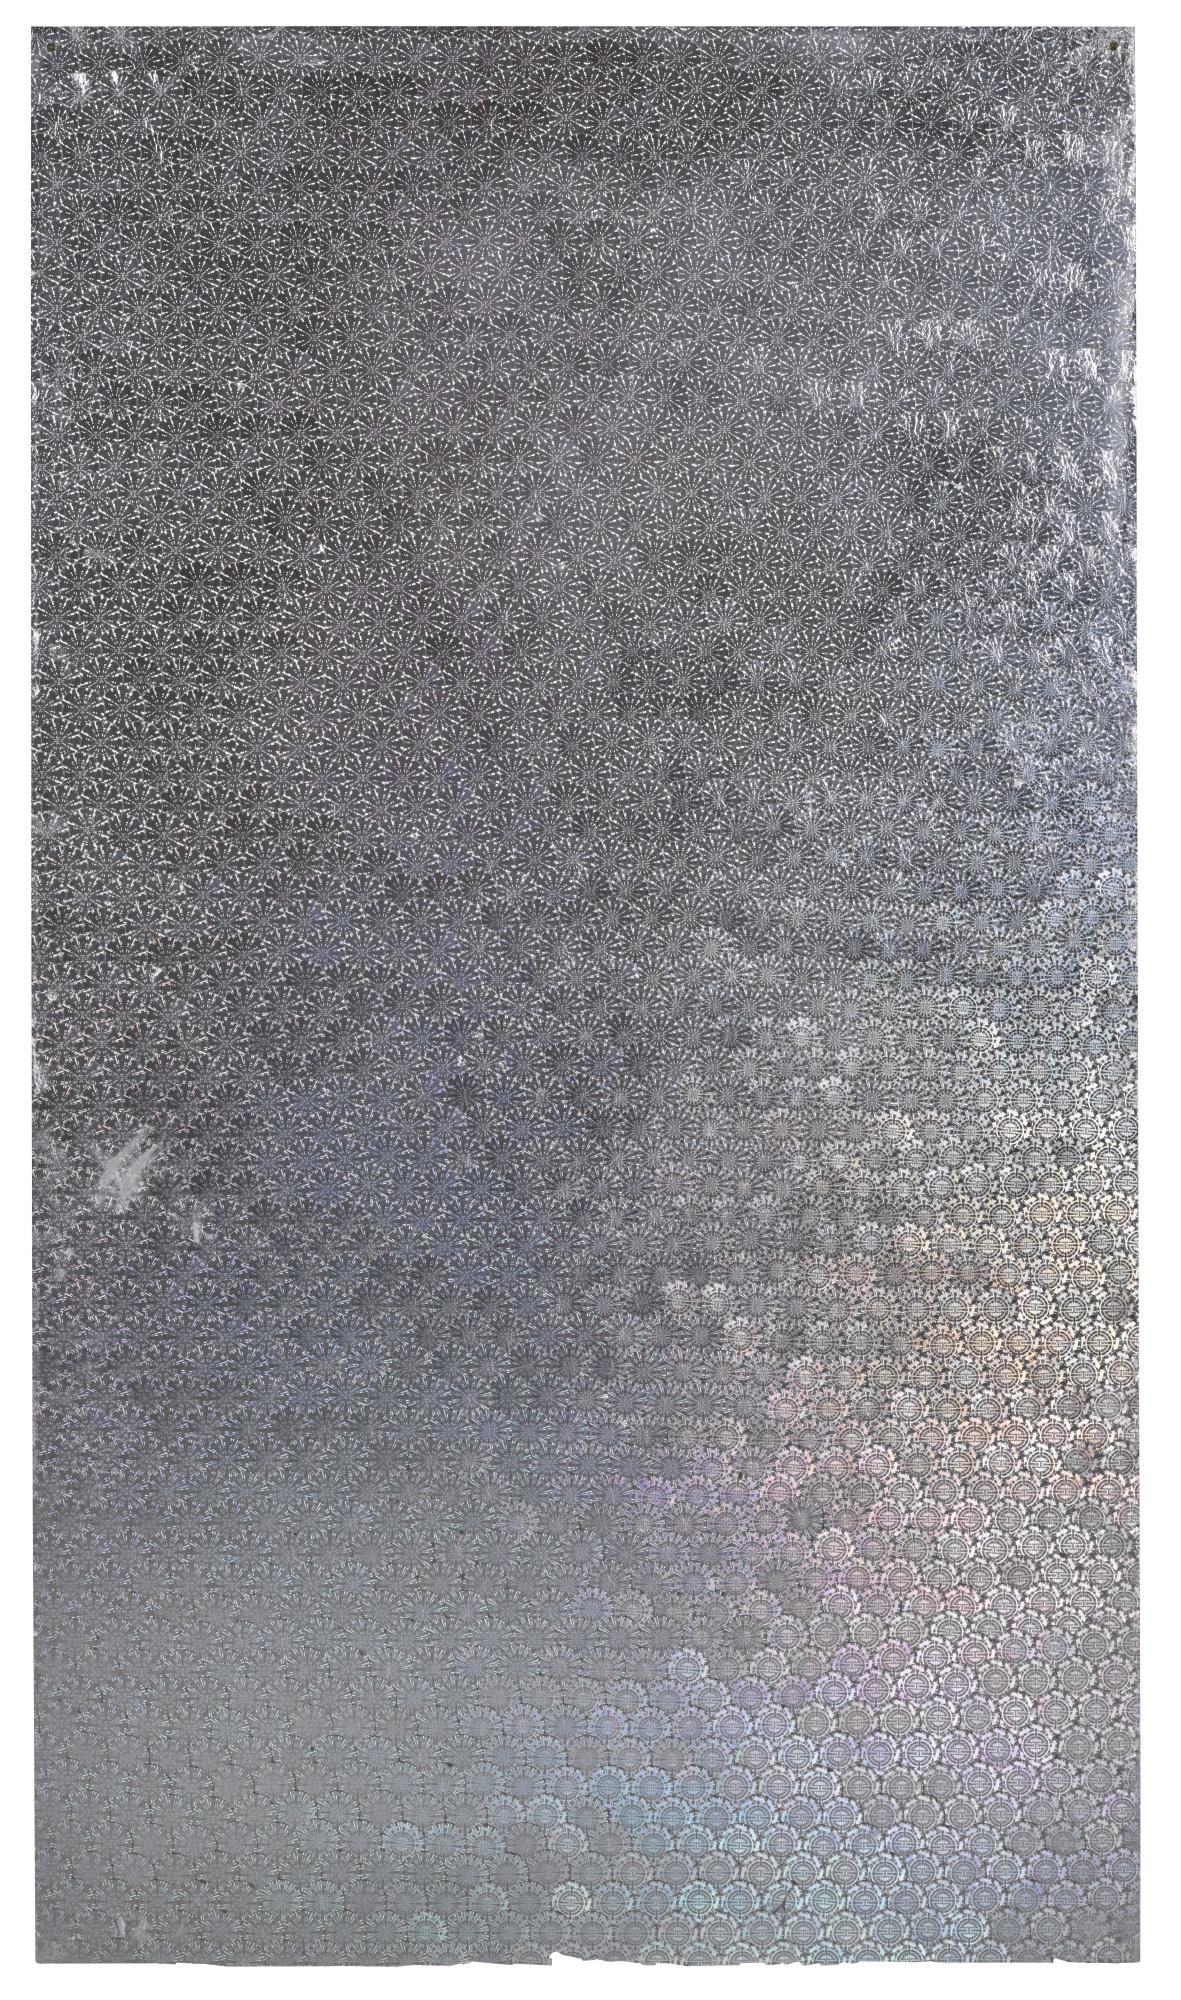 Oliver Laric-Schengen Visa Hologram-2012